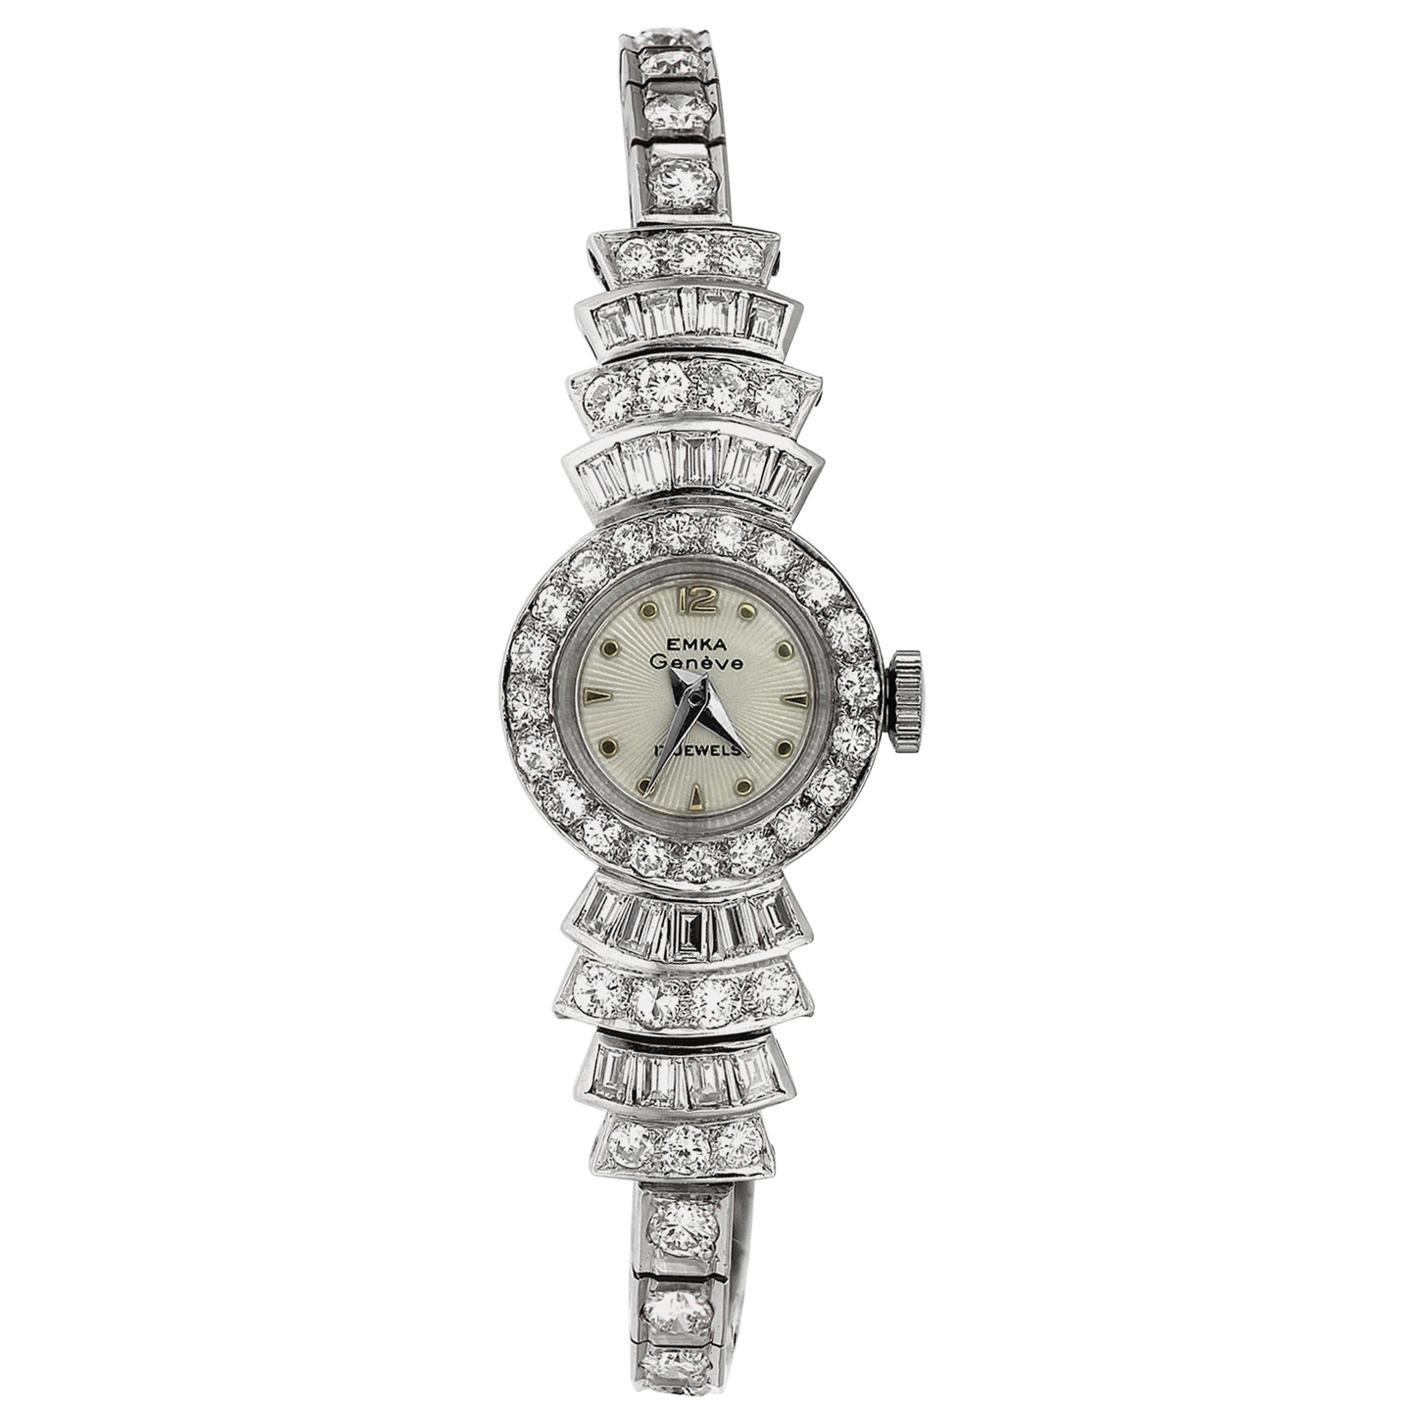 Retro/Vintage 1960's Diamond Cocktail Dress Watch in Platinum, Swiss Movement